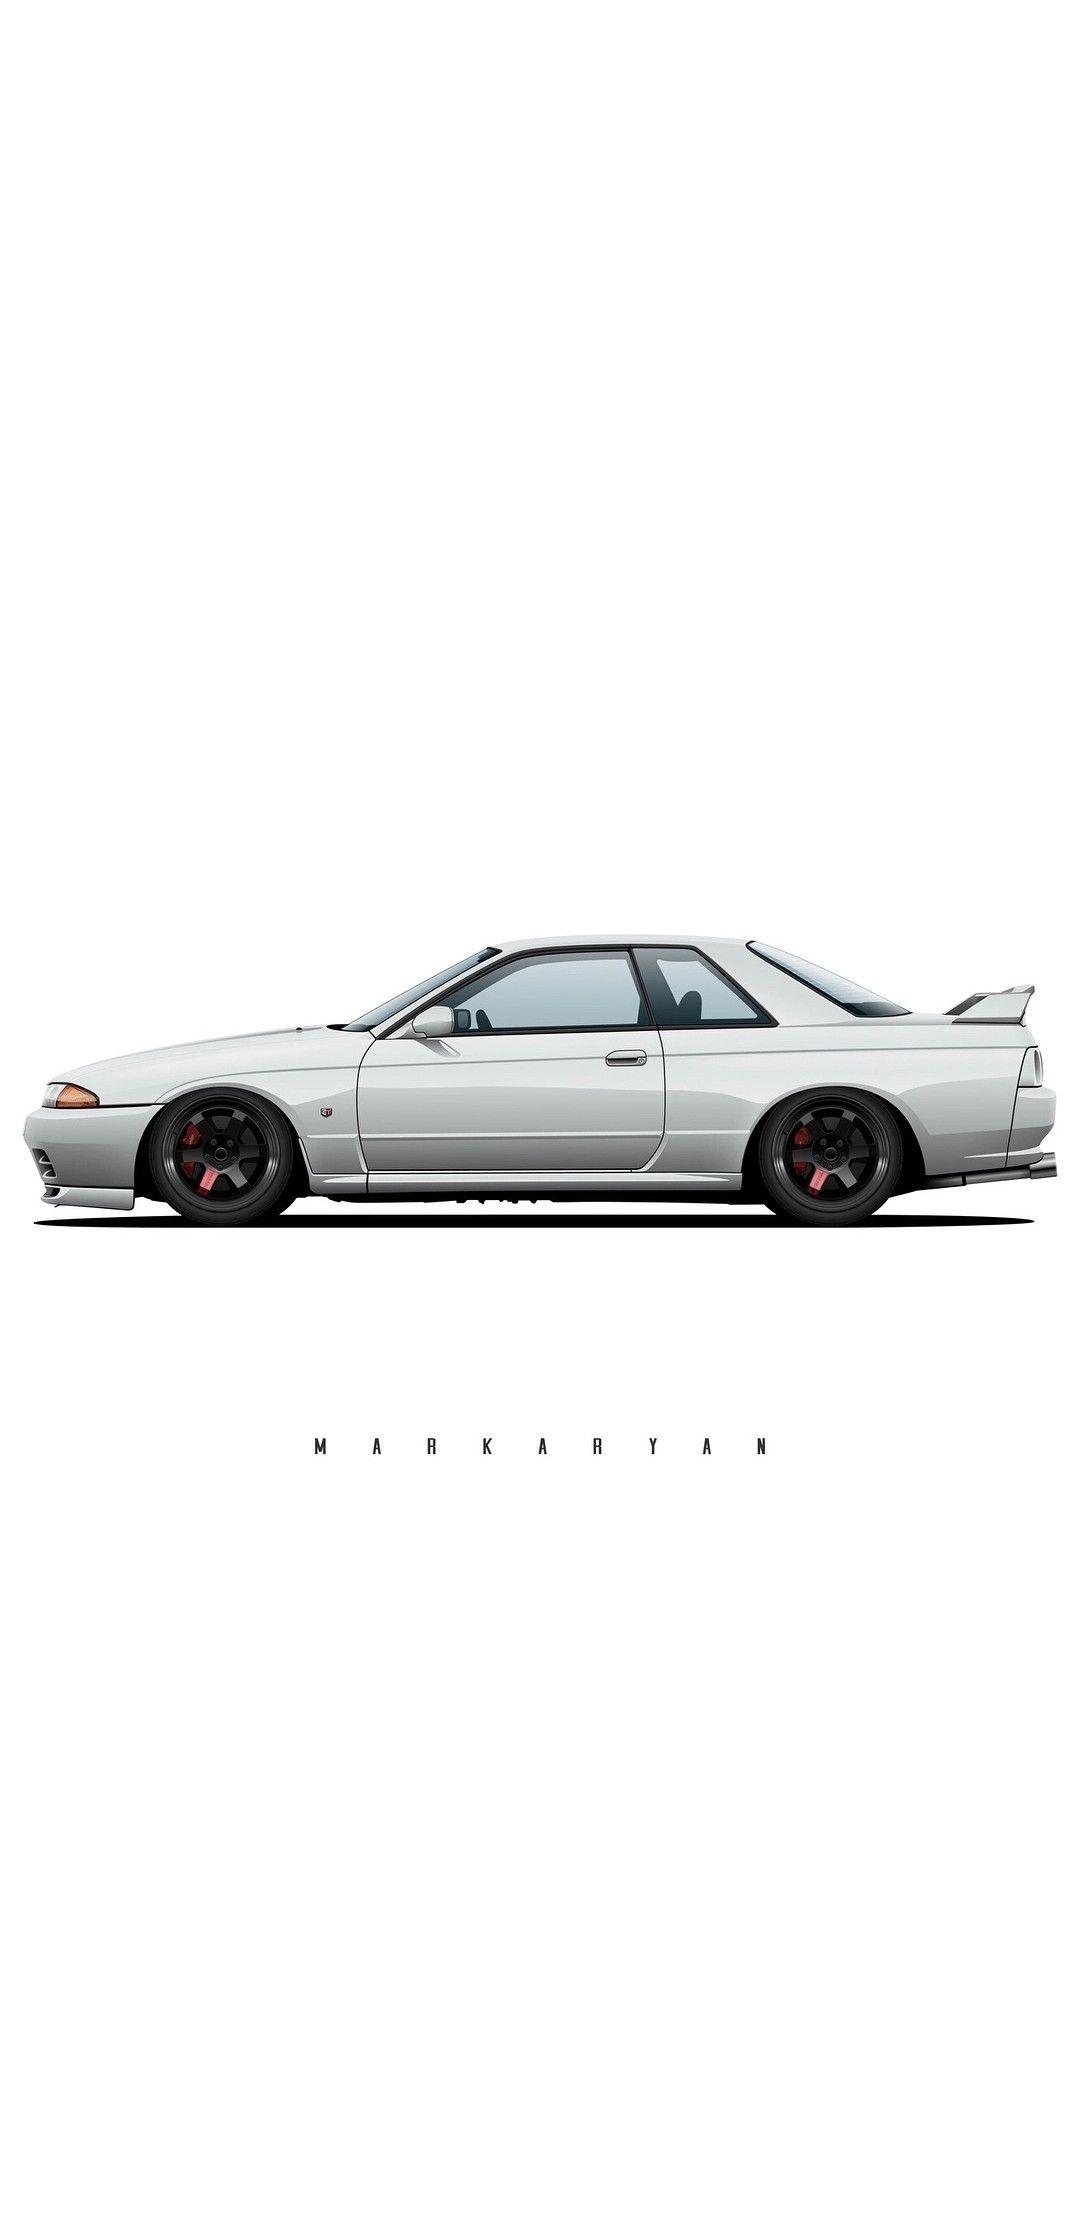 Skyline おしゃれまとめの人気アイデア Pinterest Pxxrpo スポーツカー かっこいい 車 車